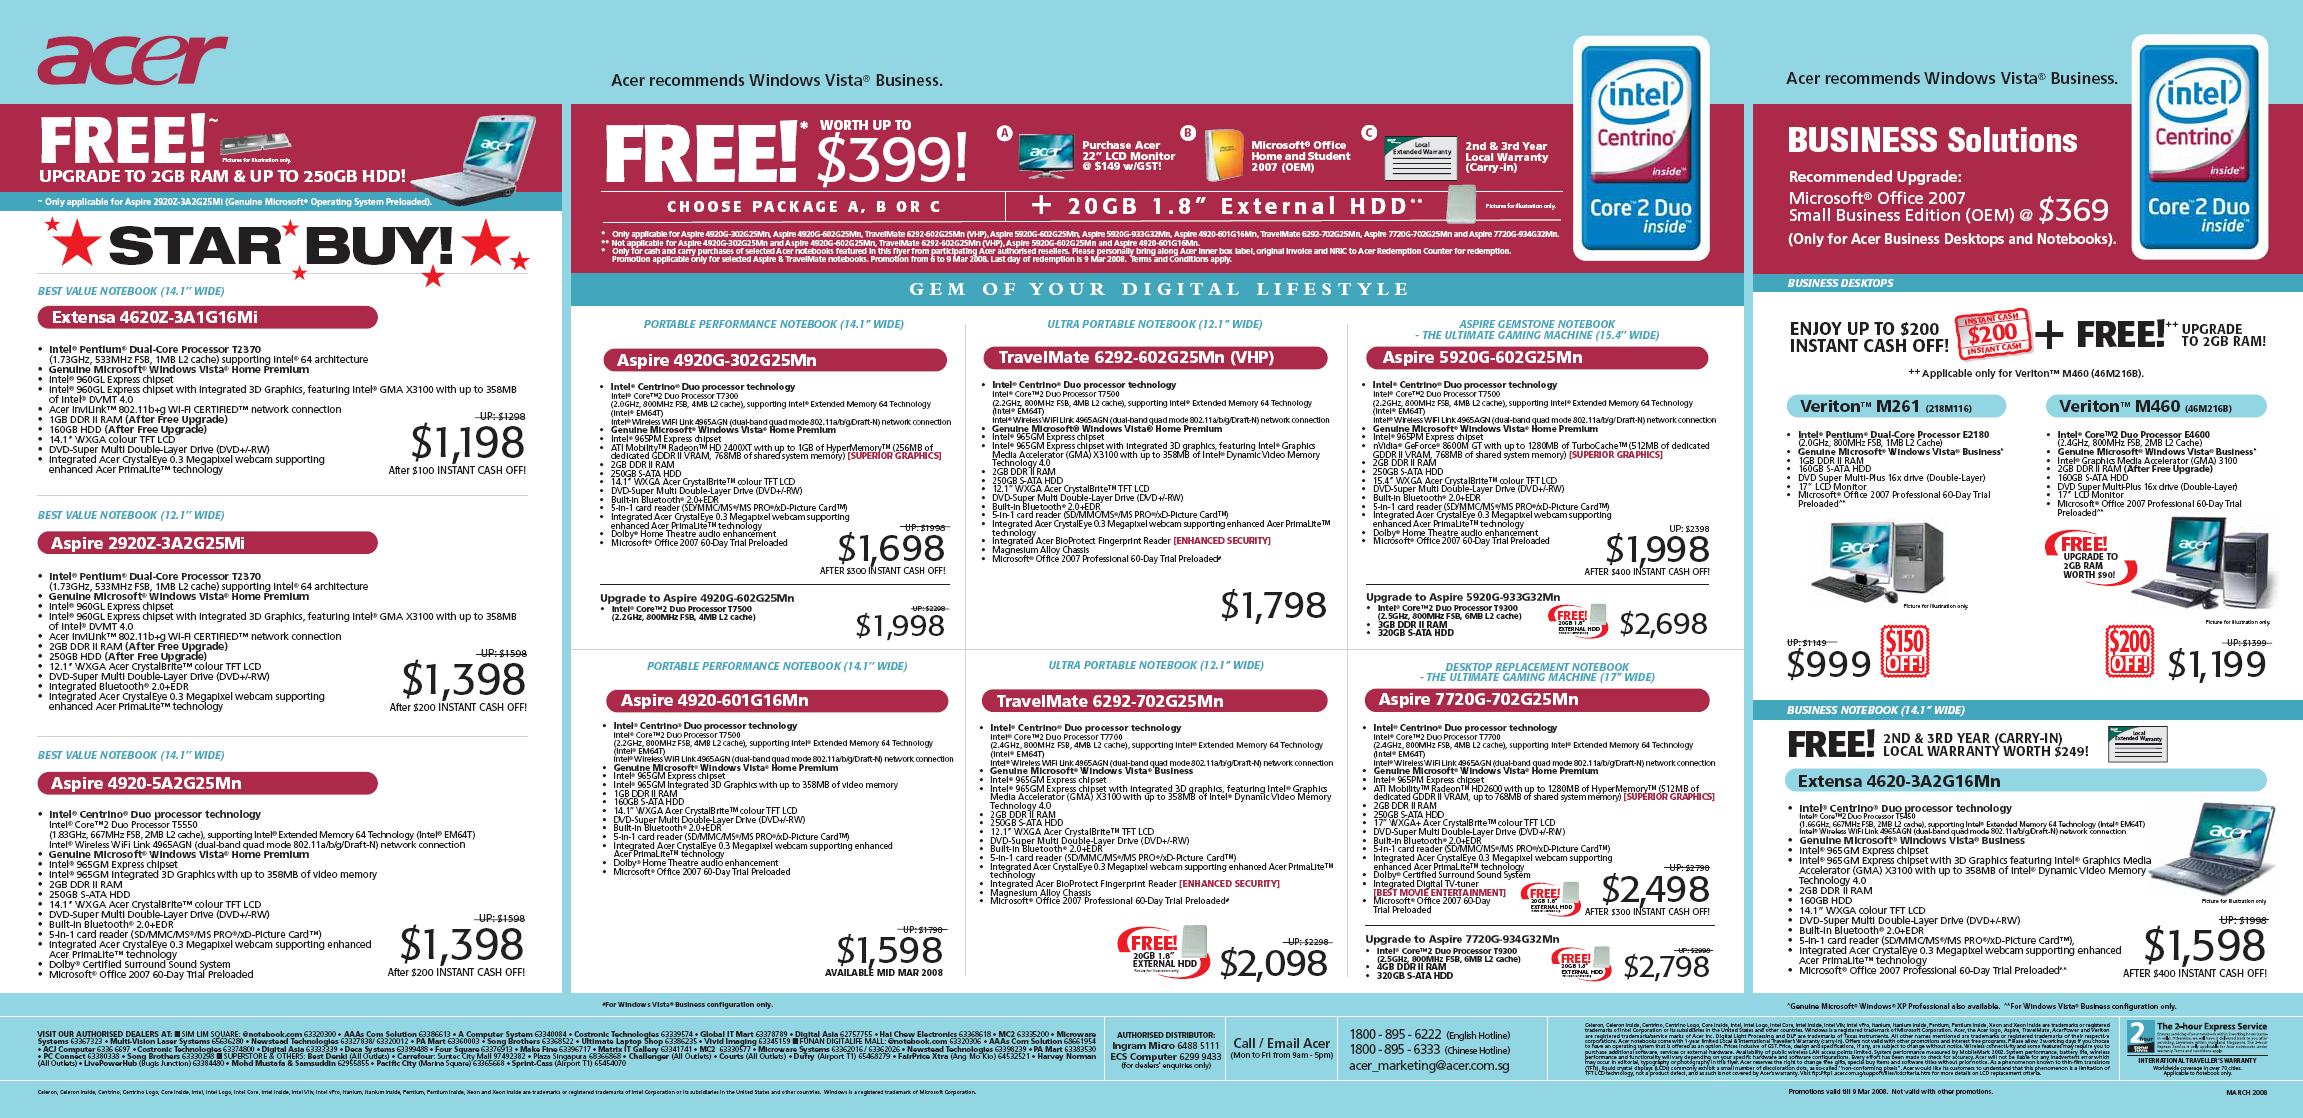 IT Show 2008 price list image brochure of Acer Notebooks Desktop Extensa 4620z Aspire 2920z 4920 TravelMate 6292 Veriton M261 M460